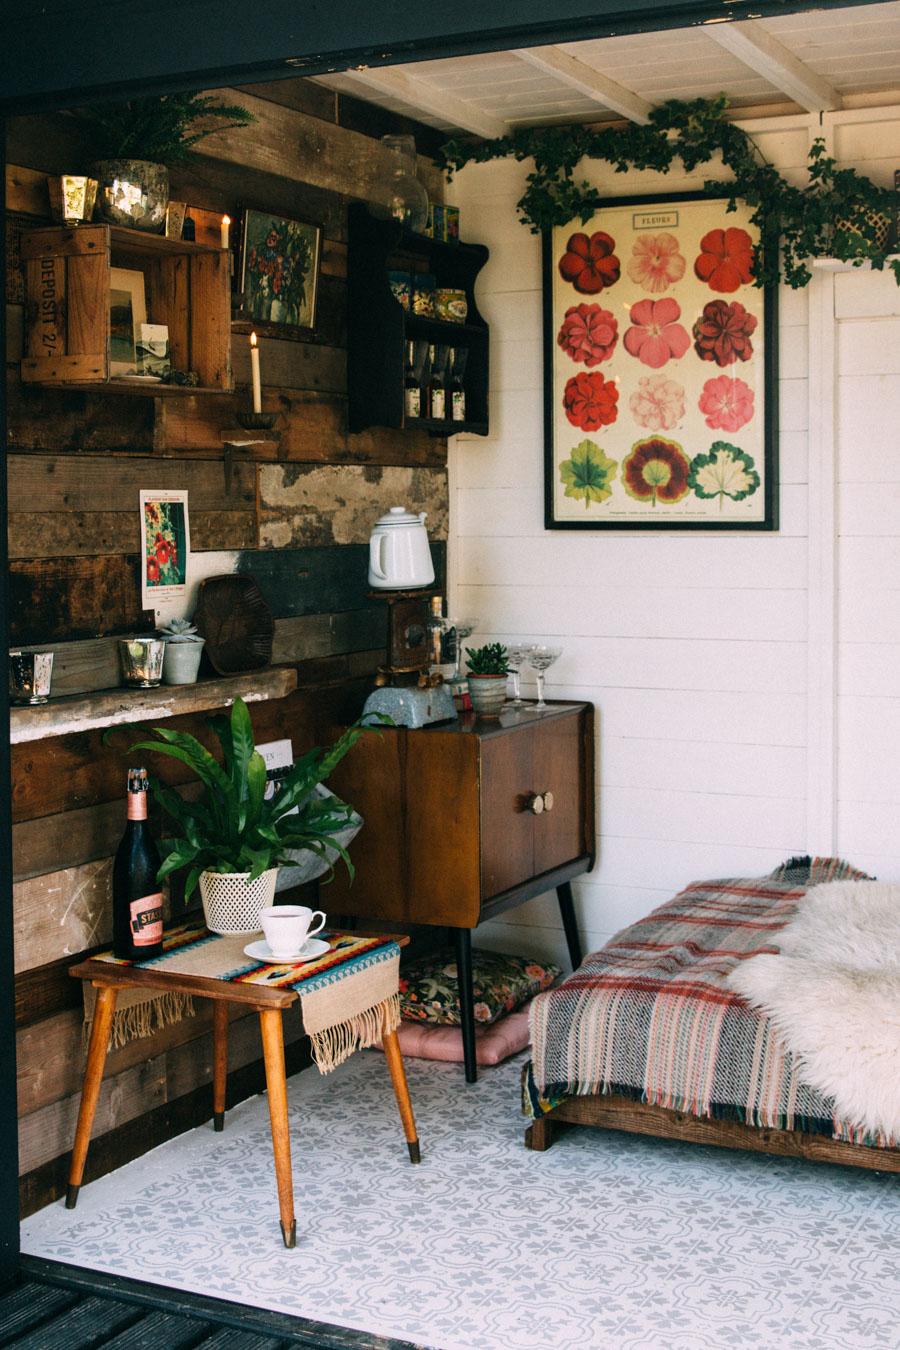 Creating a rustic garden retreat